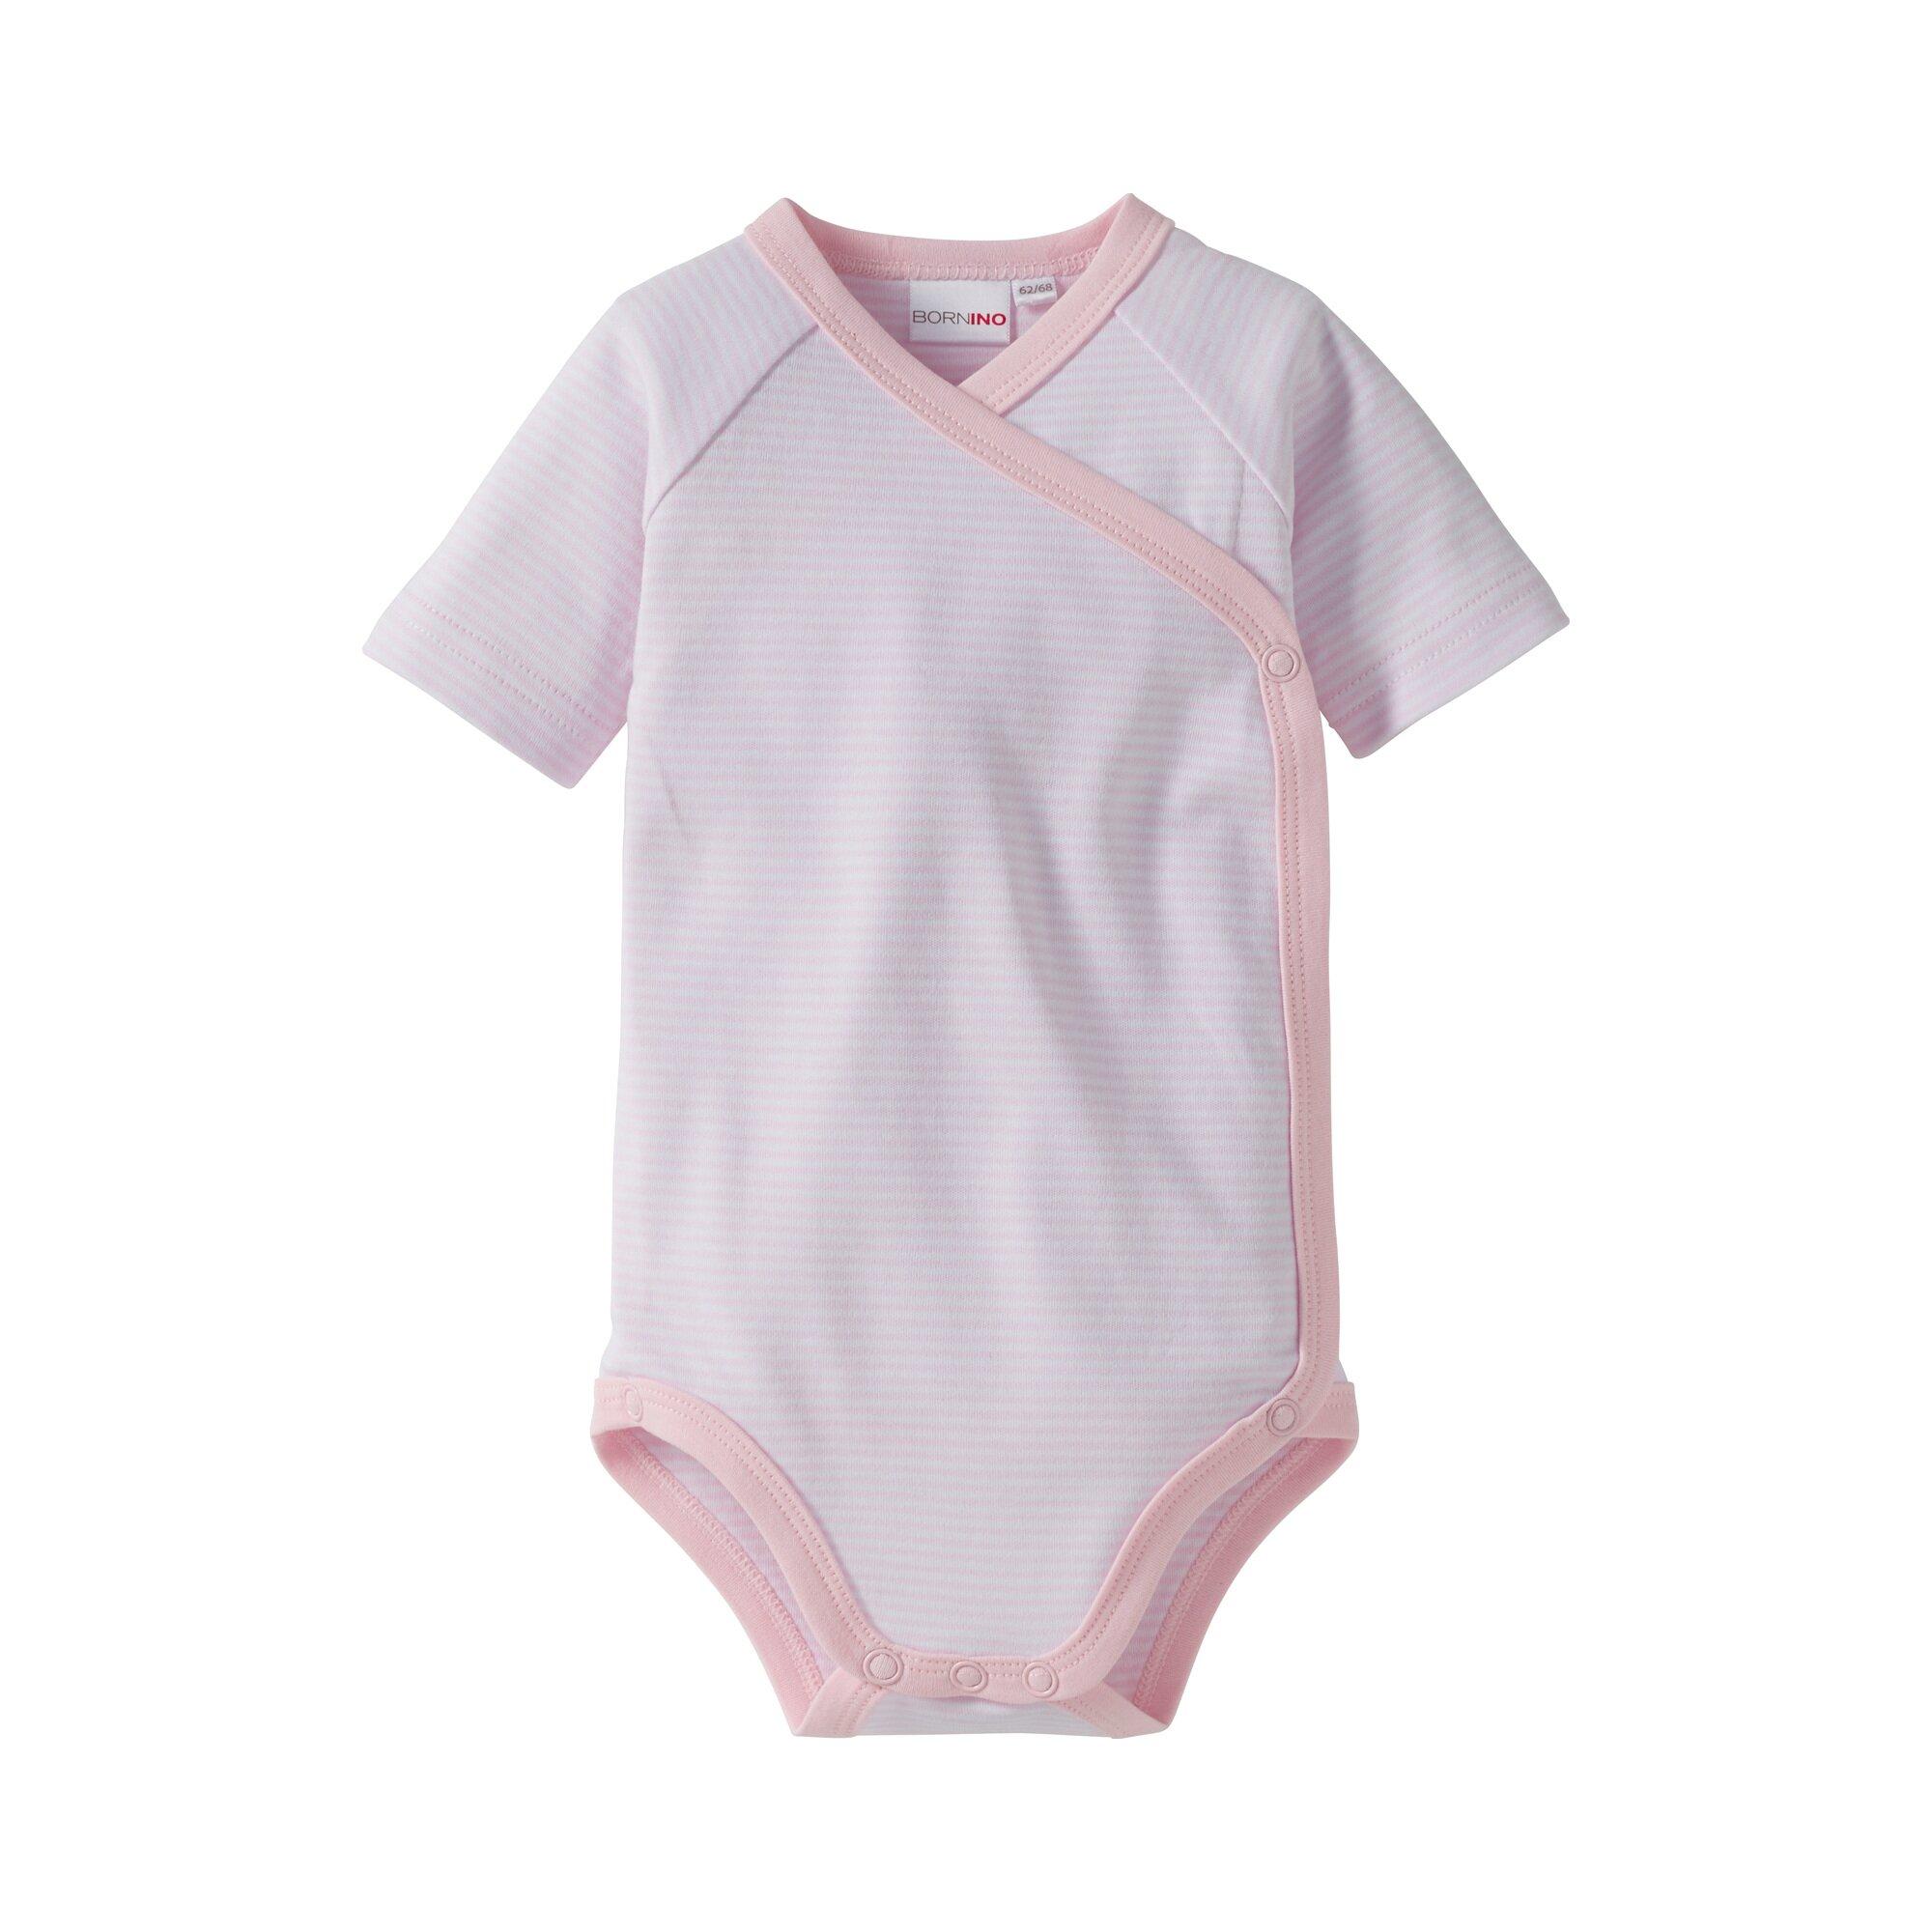 basics-baby-wickelbody-kurzarm-3er-pack-rosa-50-62-74